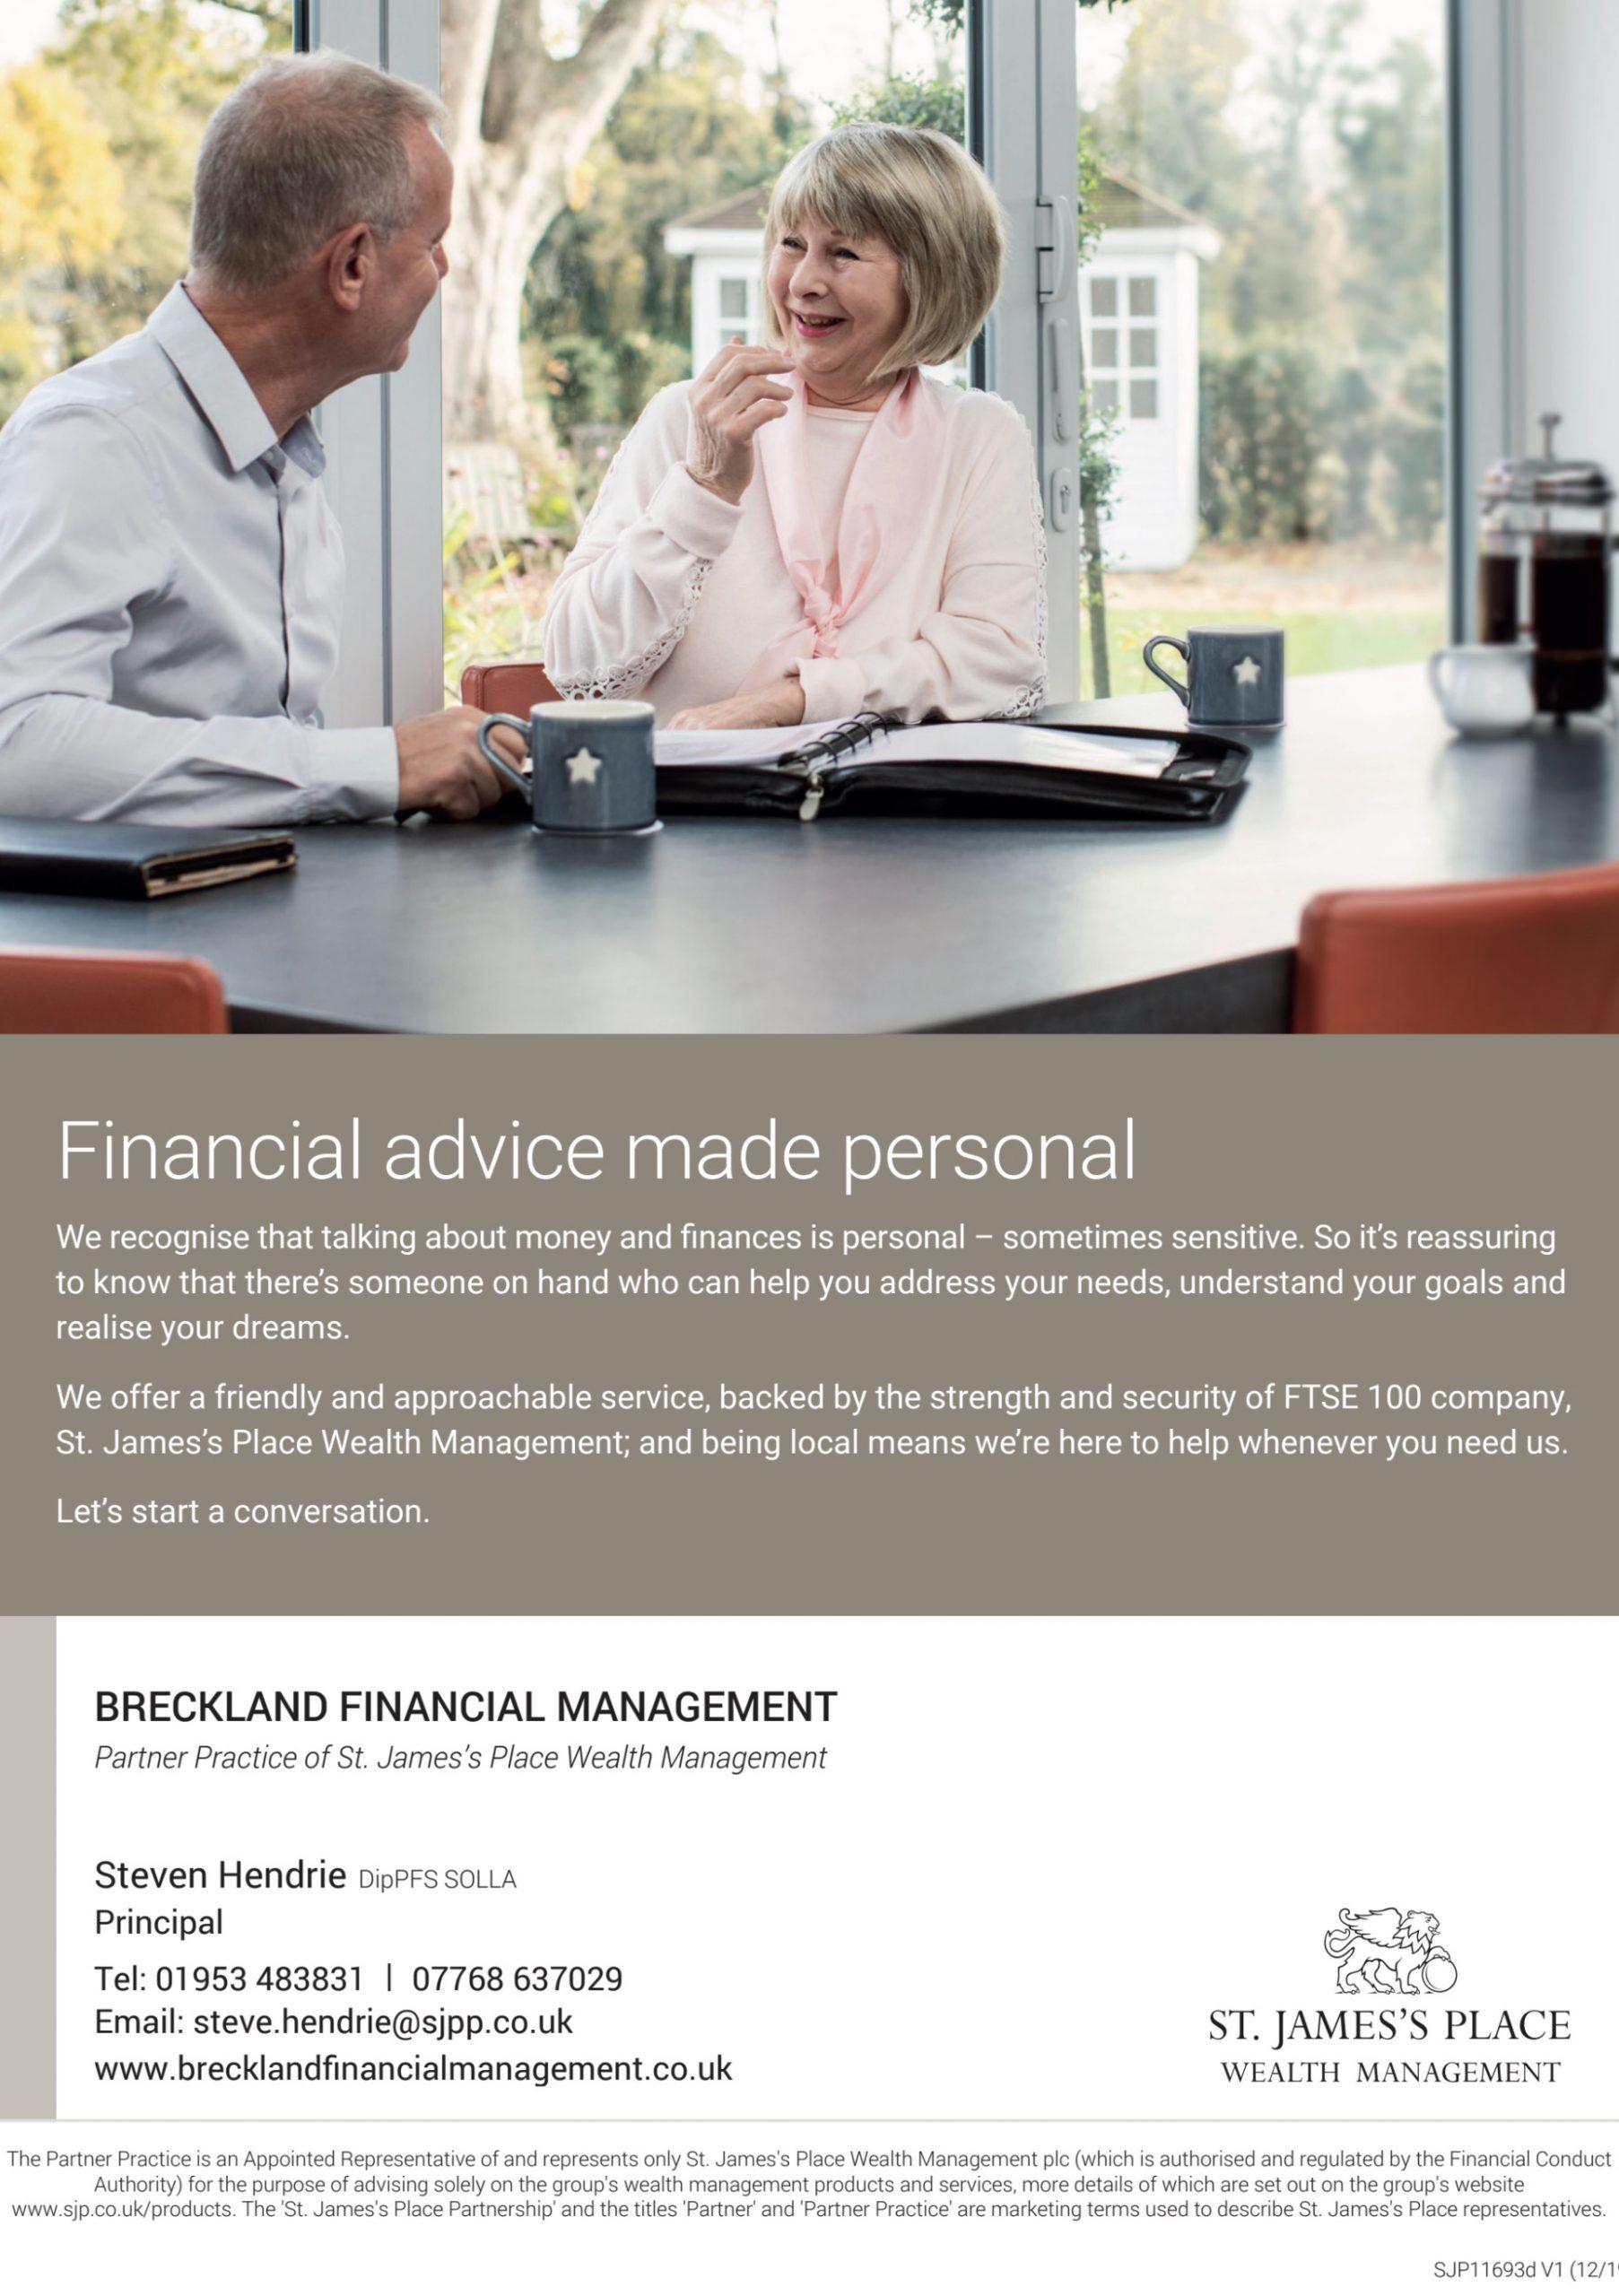 Breckland Financial Management